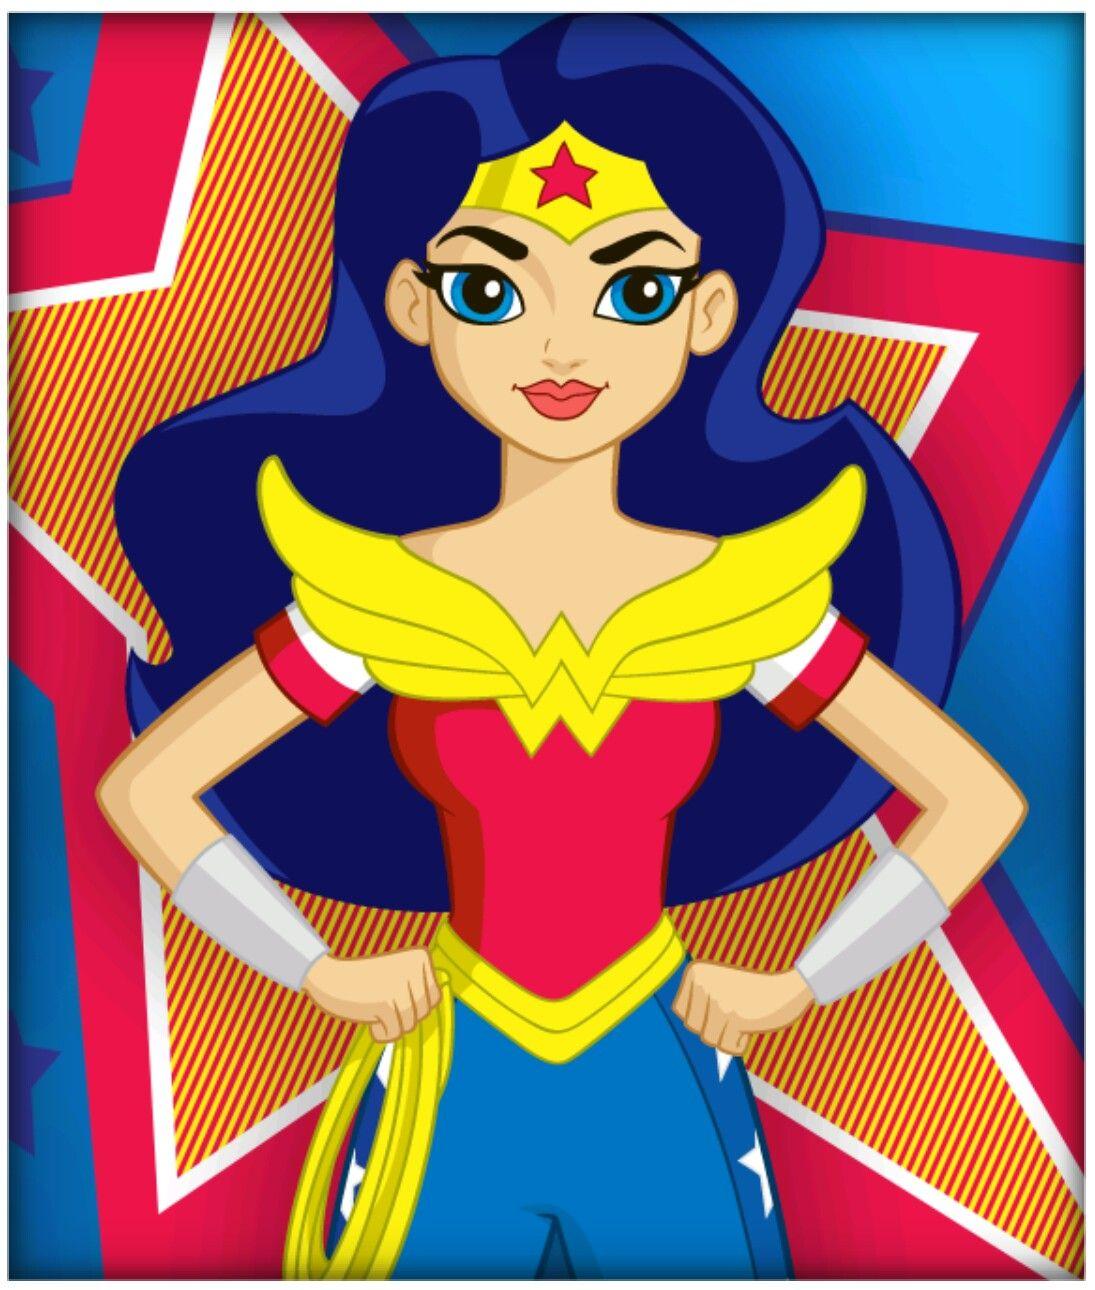 DC Super Hero Girls - Wonder Woman  7a4126eaf